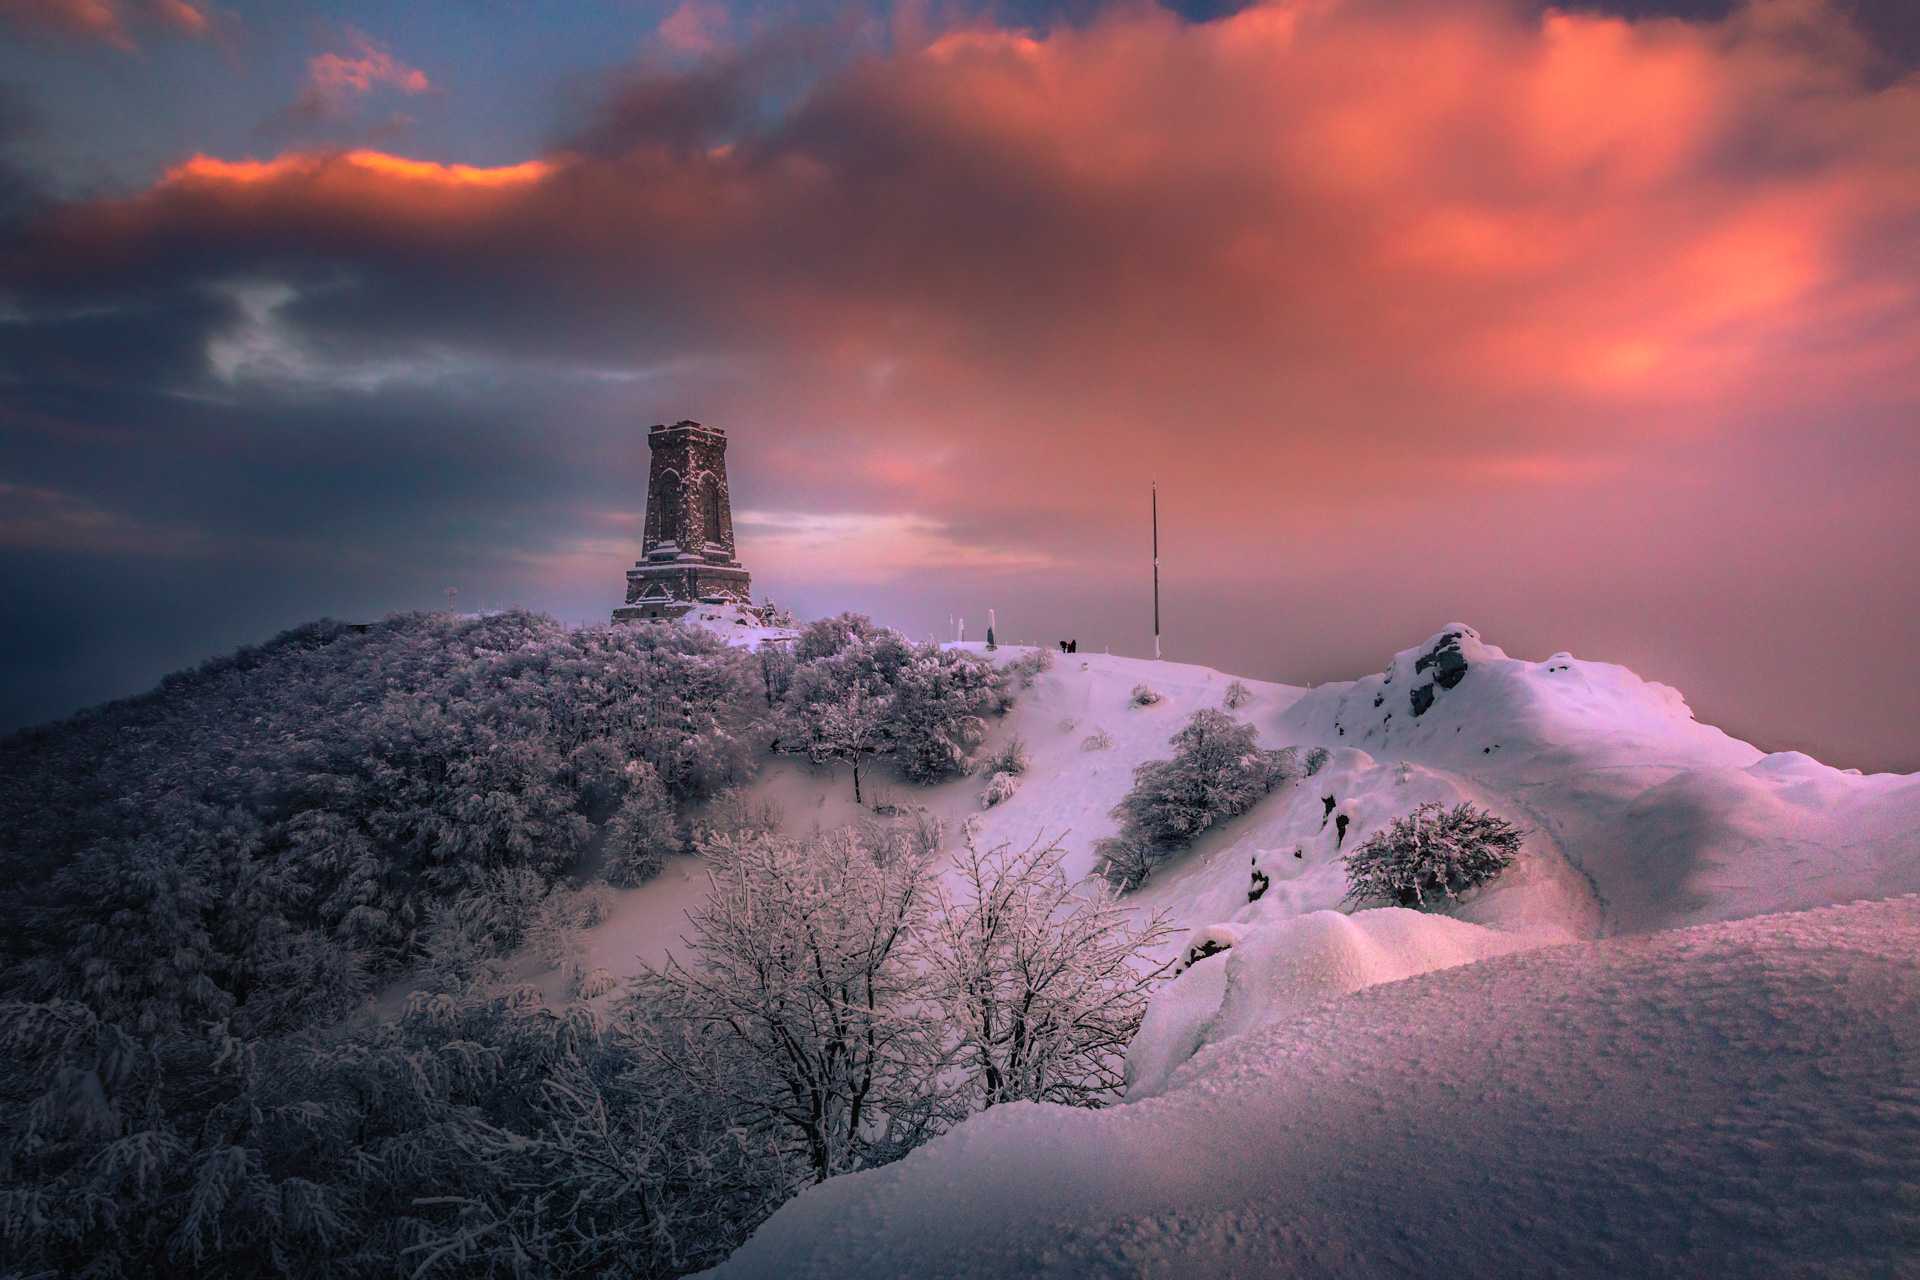 Photo in Landscape | Author Plpenov | PHOTO FORUM